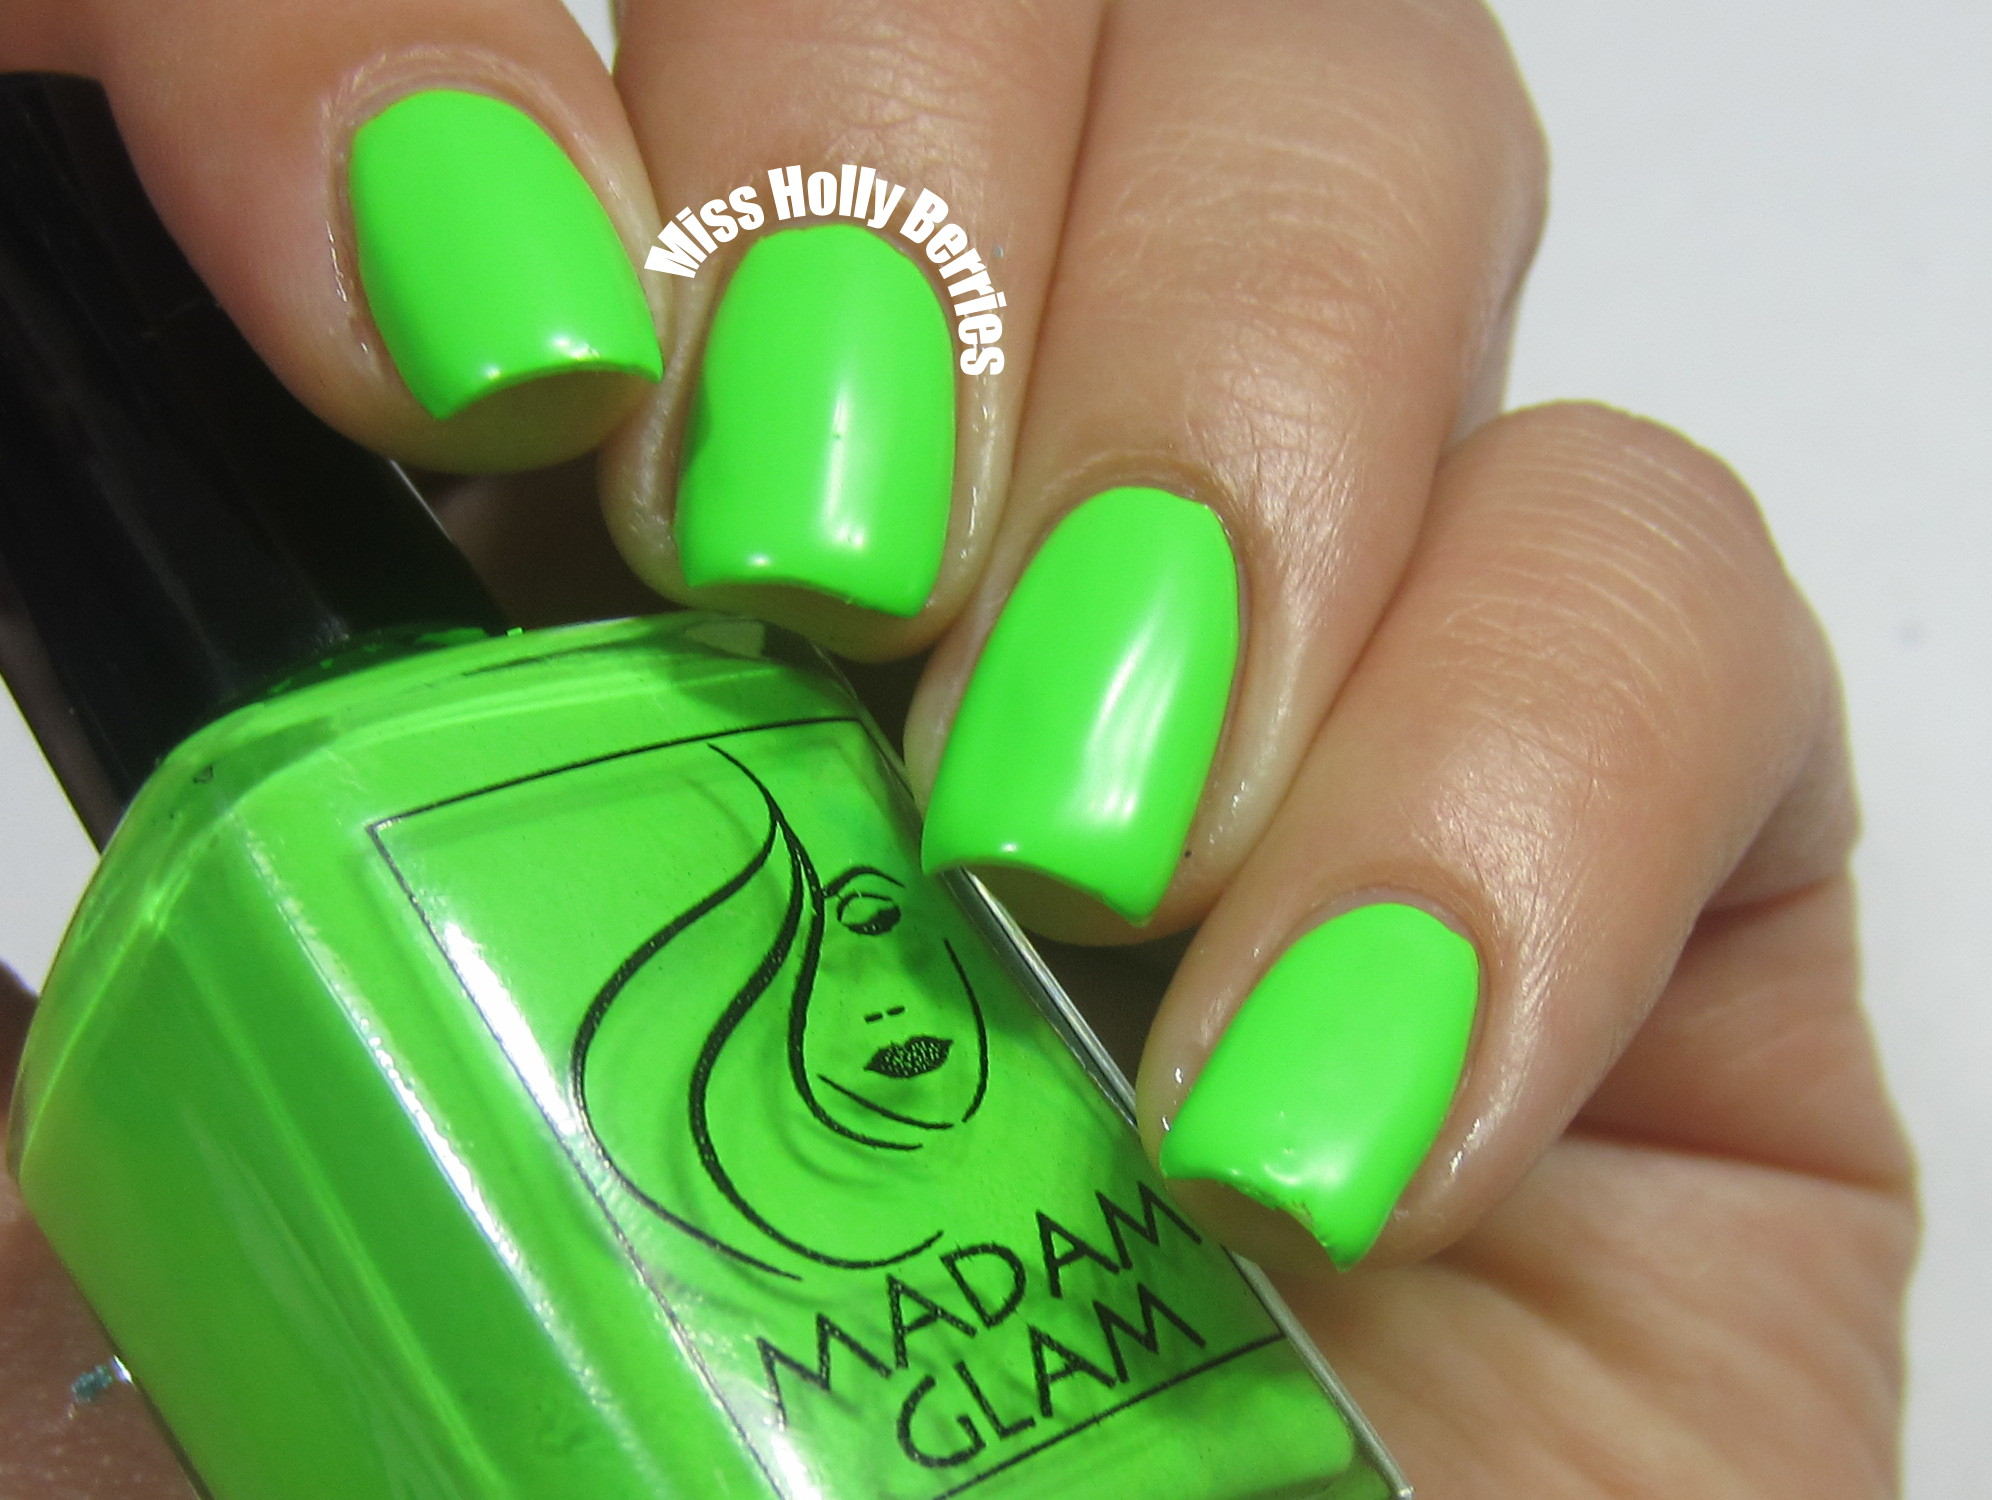 Madam Glam Nail Polish Review! | misshollyberries